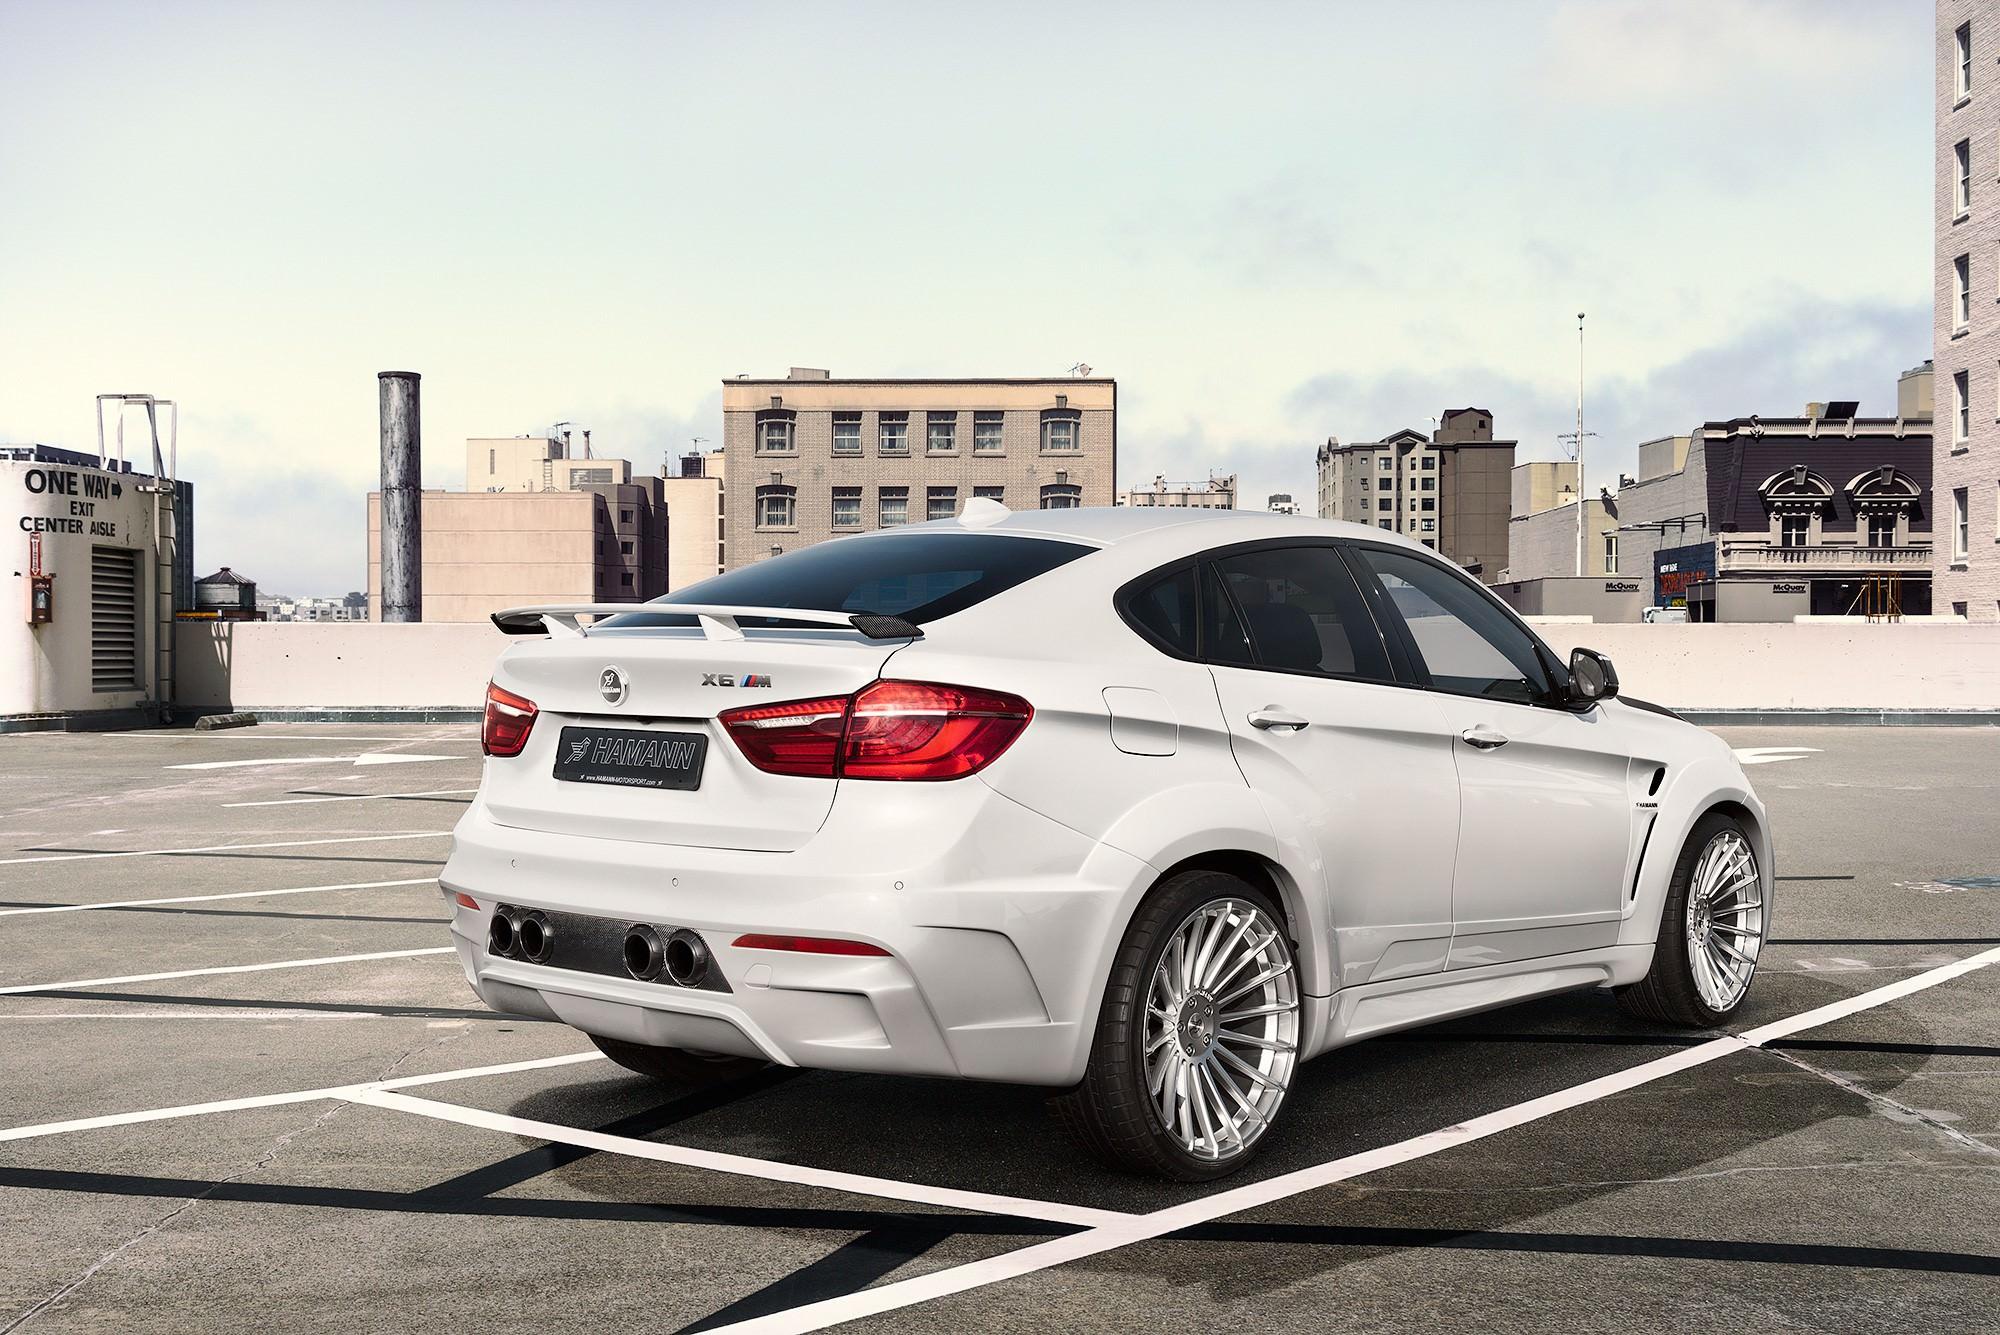 , BMW X6 / X6M, Pitlane Tuning Shop